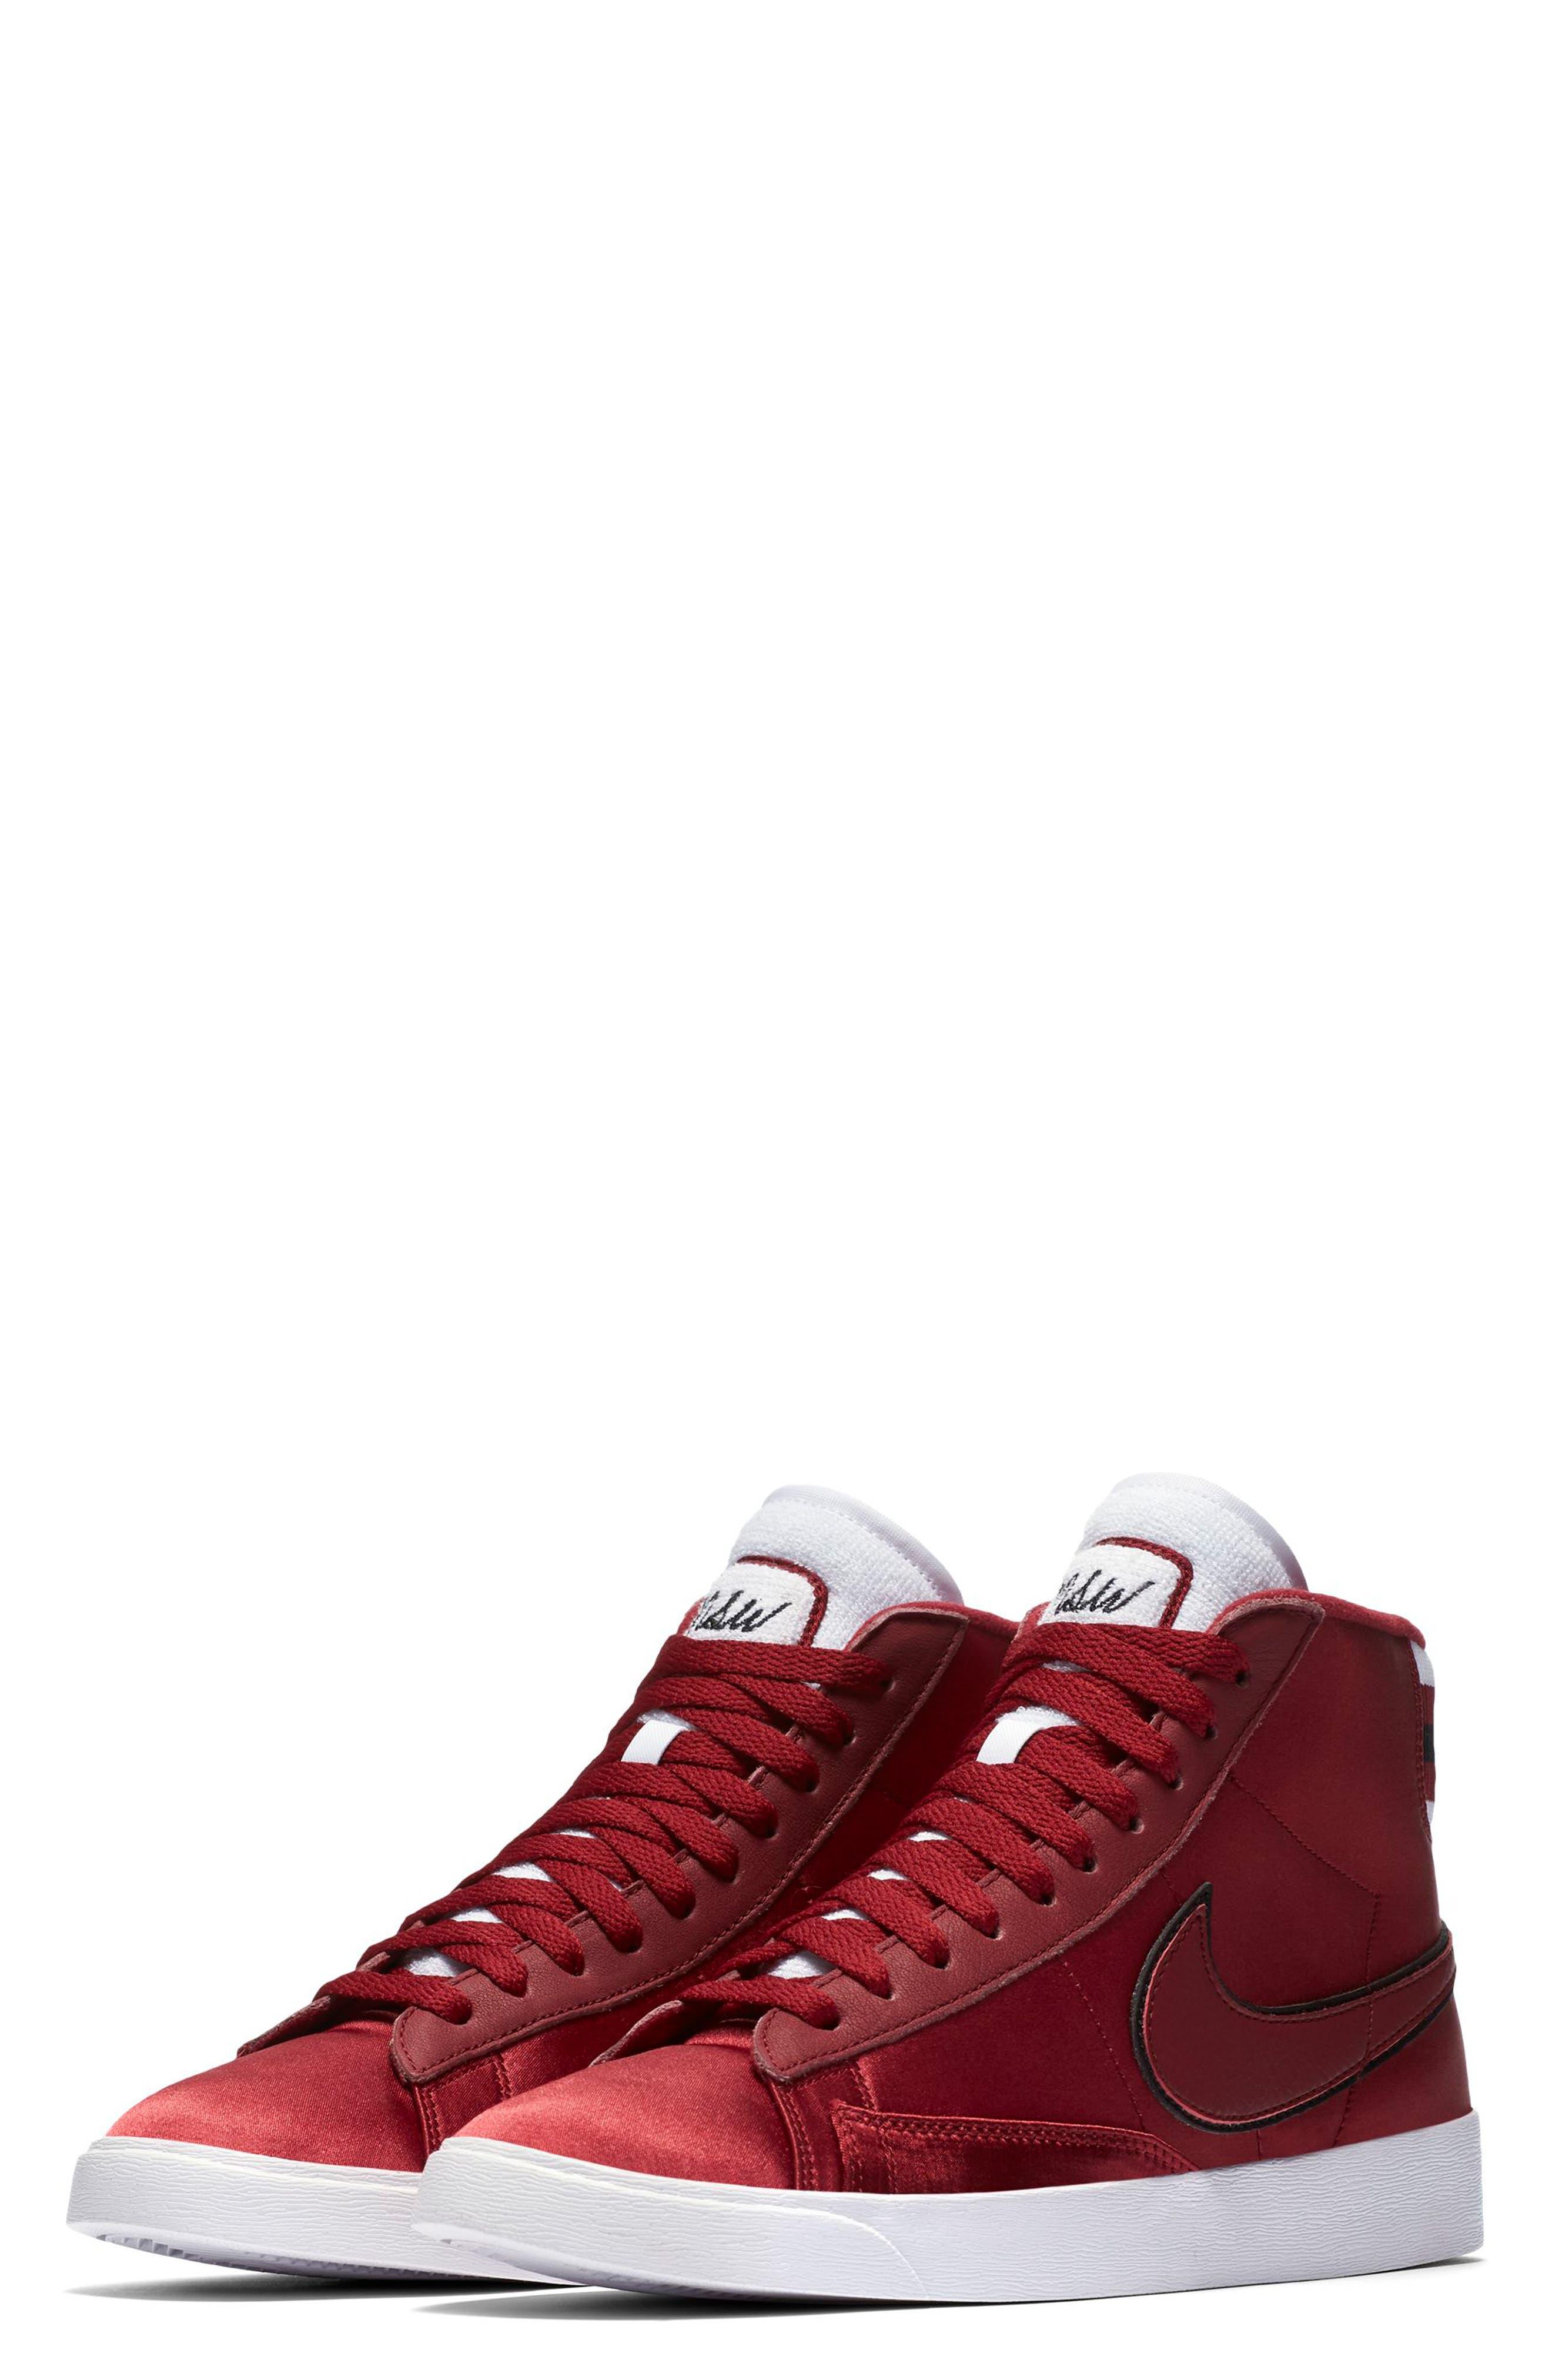 Blazer Mid Top Sneaker,                             Main thumbnail 1, color,                             RED CRUSH/ WHITE/ BLACK